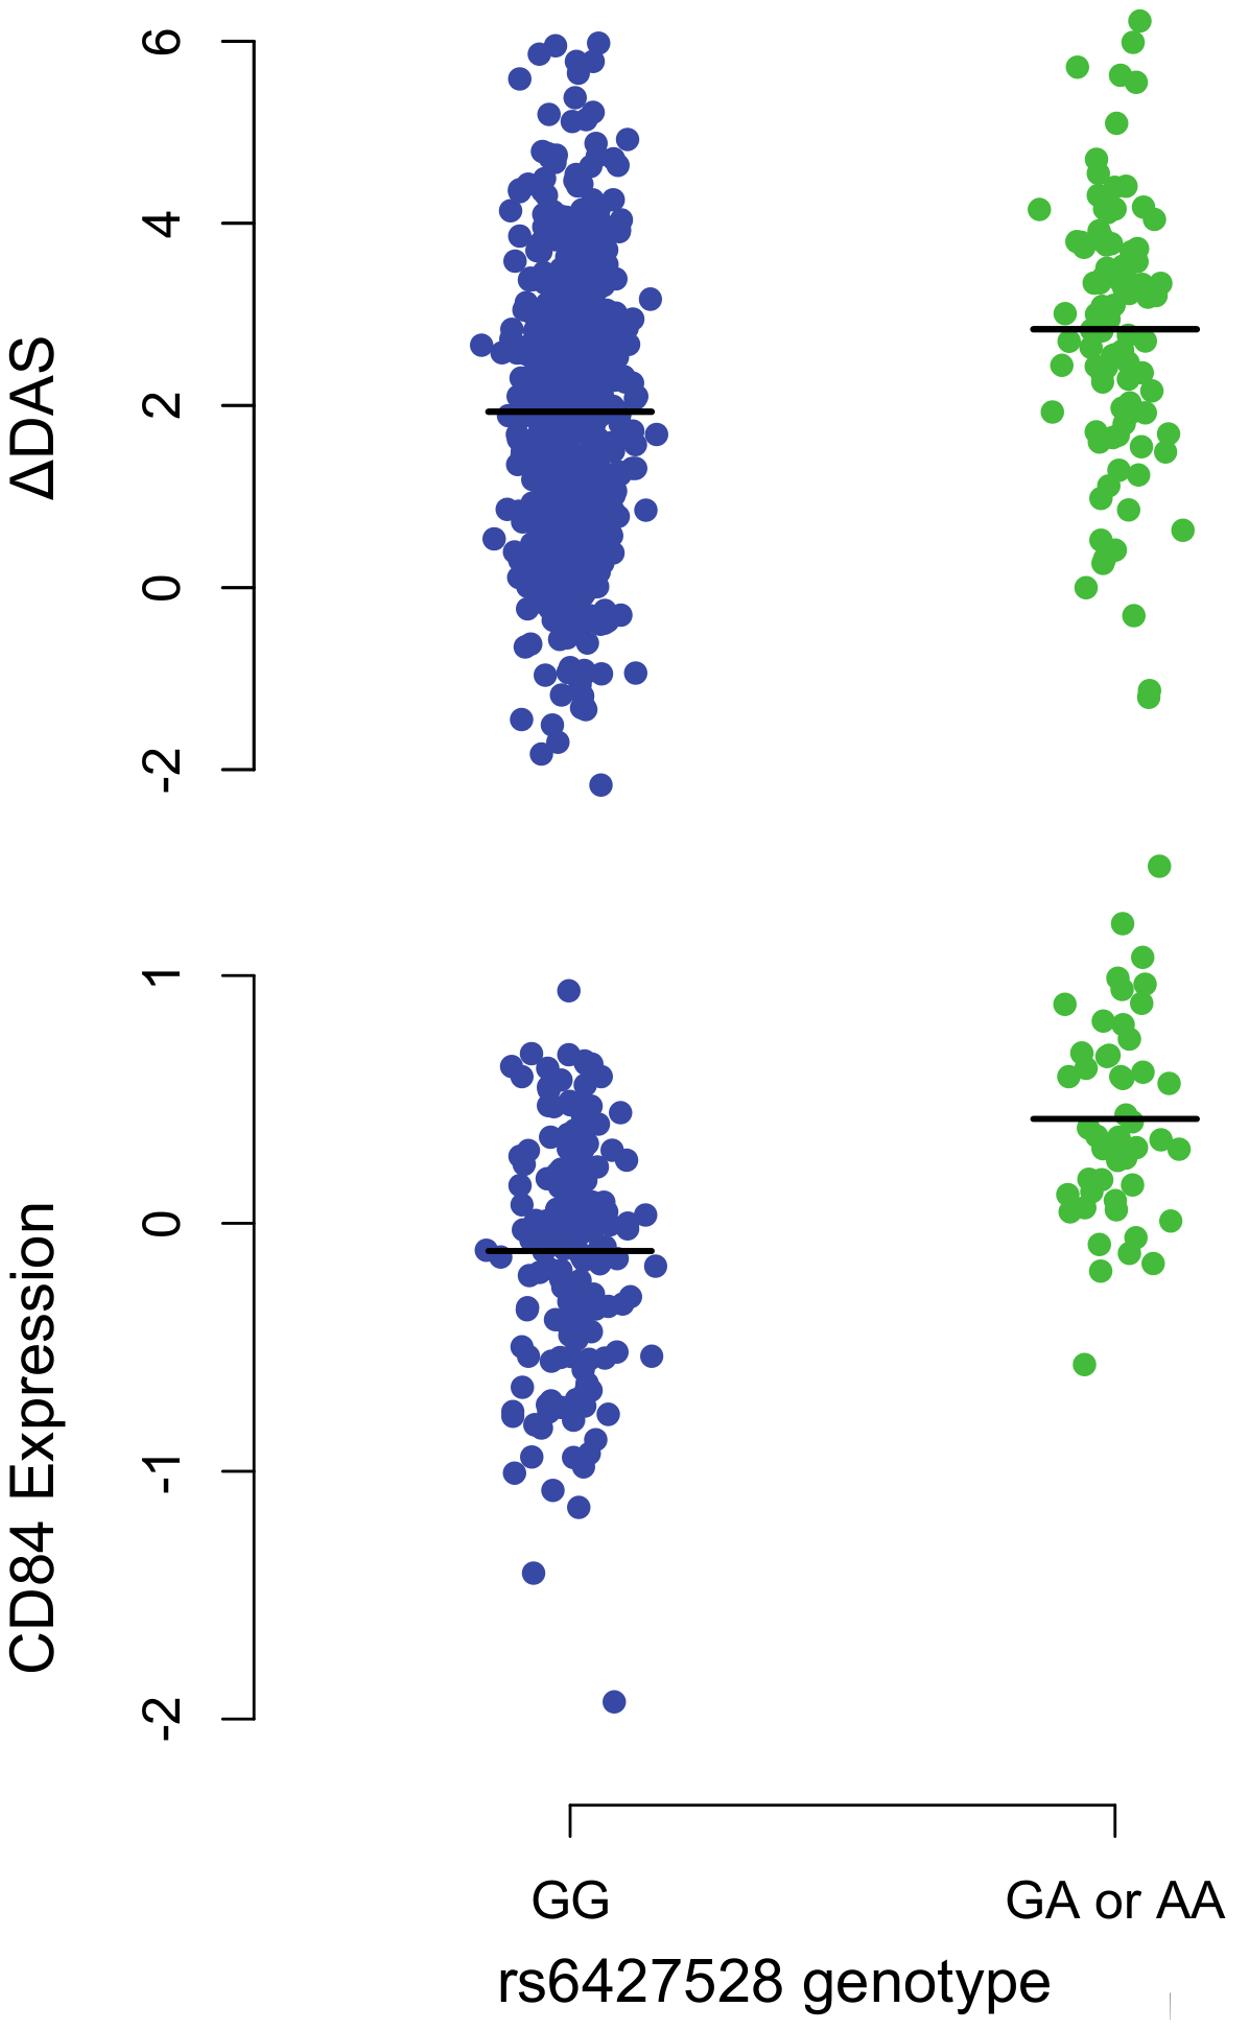 <i>1q23/CD84</i> genotype association plots for ΔDAS and <i>CD84</i> gene expression.